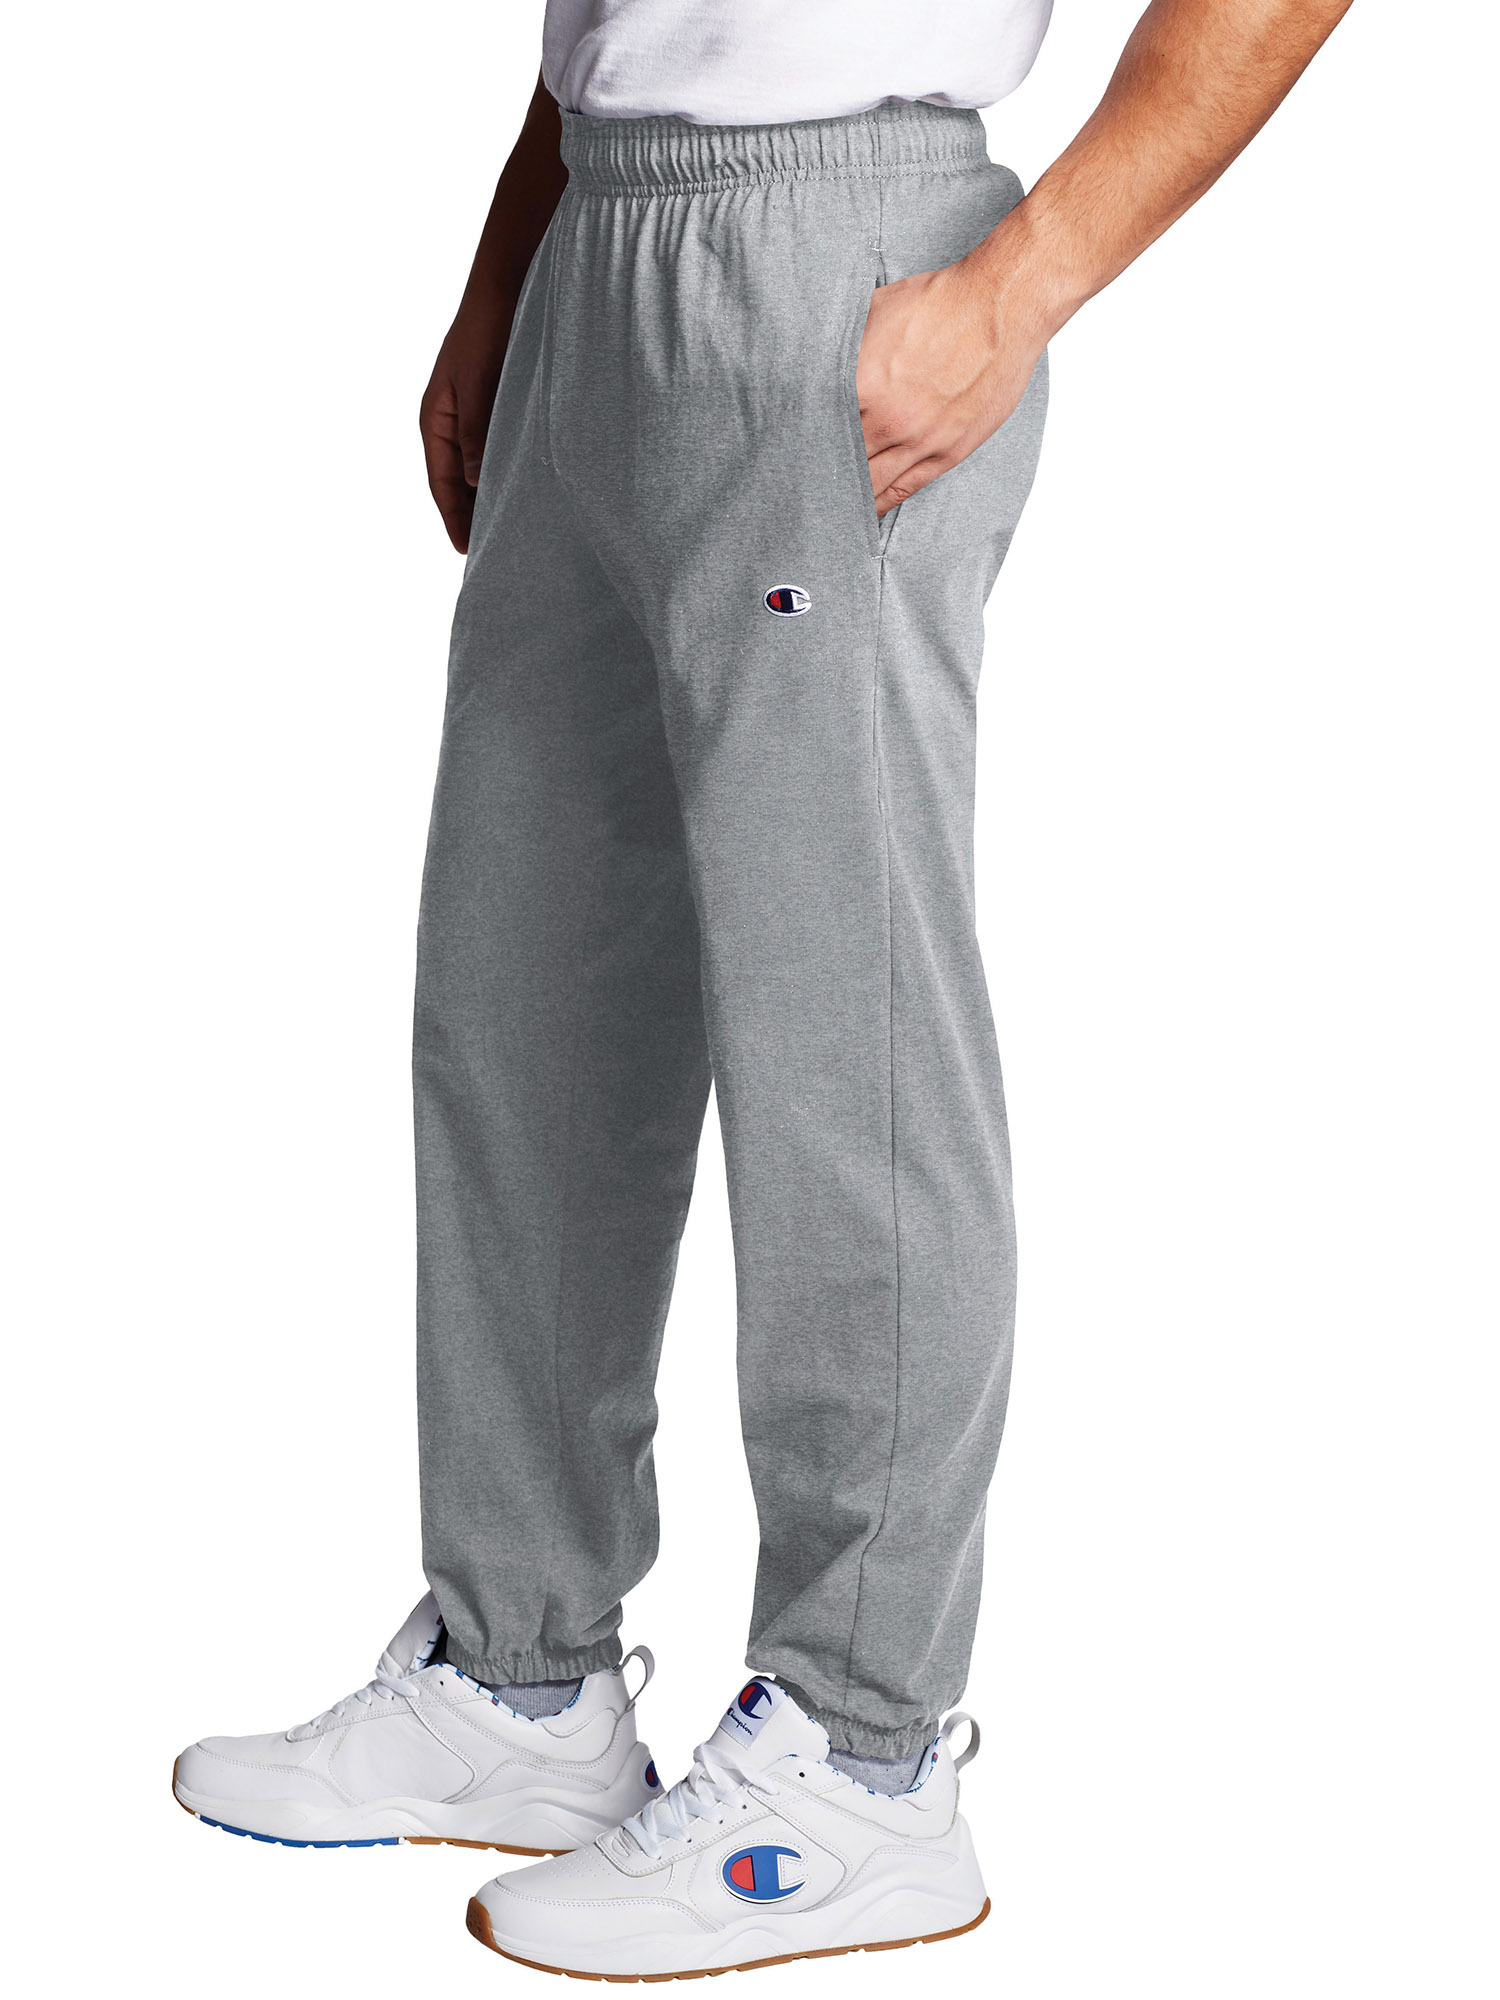 Champion Men Sweatpants Joggers Jersey Sweat Pants Black Medium 100/% Cotton Gift